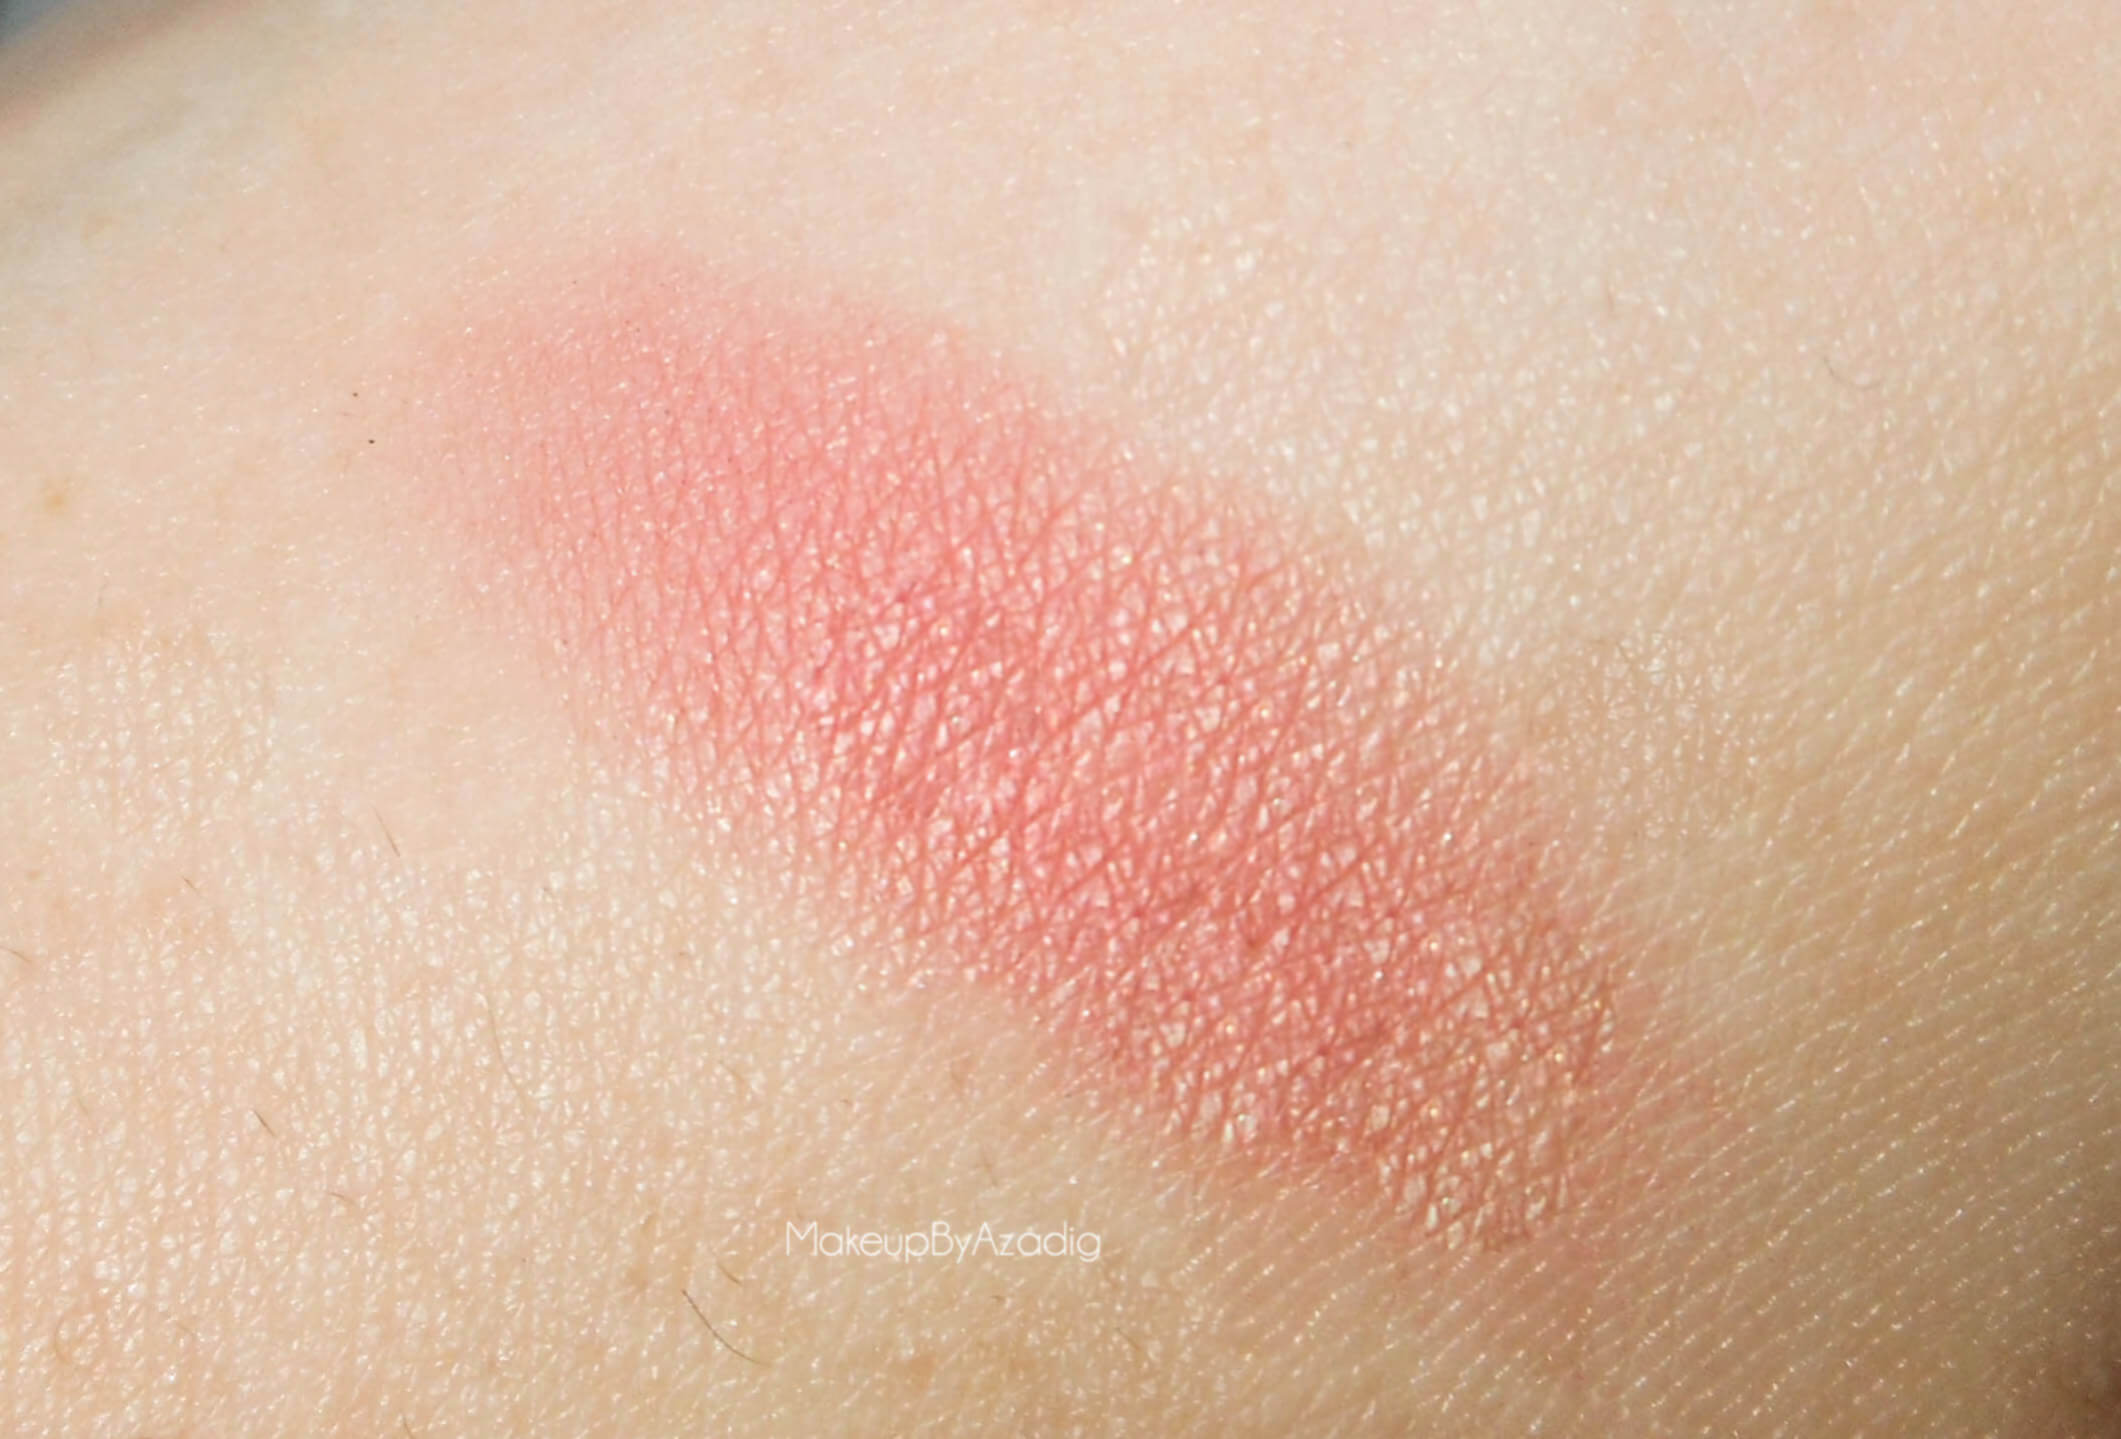 makeupbyazadig-love-flush-blush-too-faced-love-hangover-blog-influencer-sephora-france-swatch